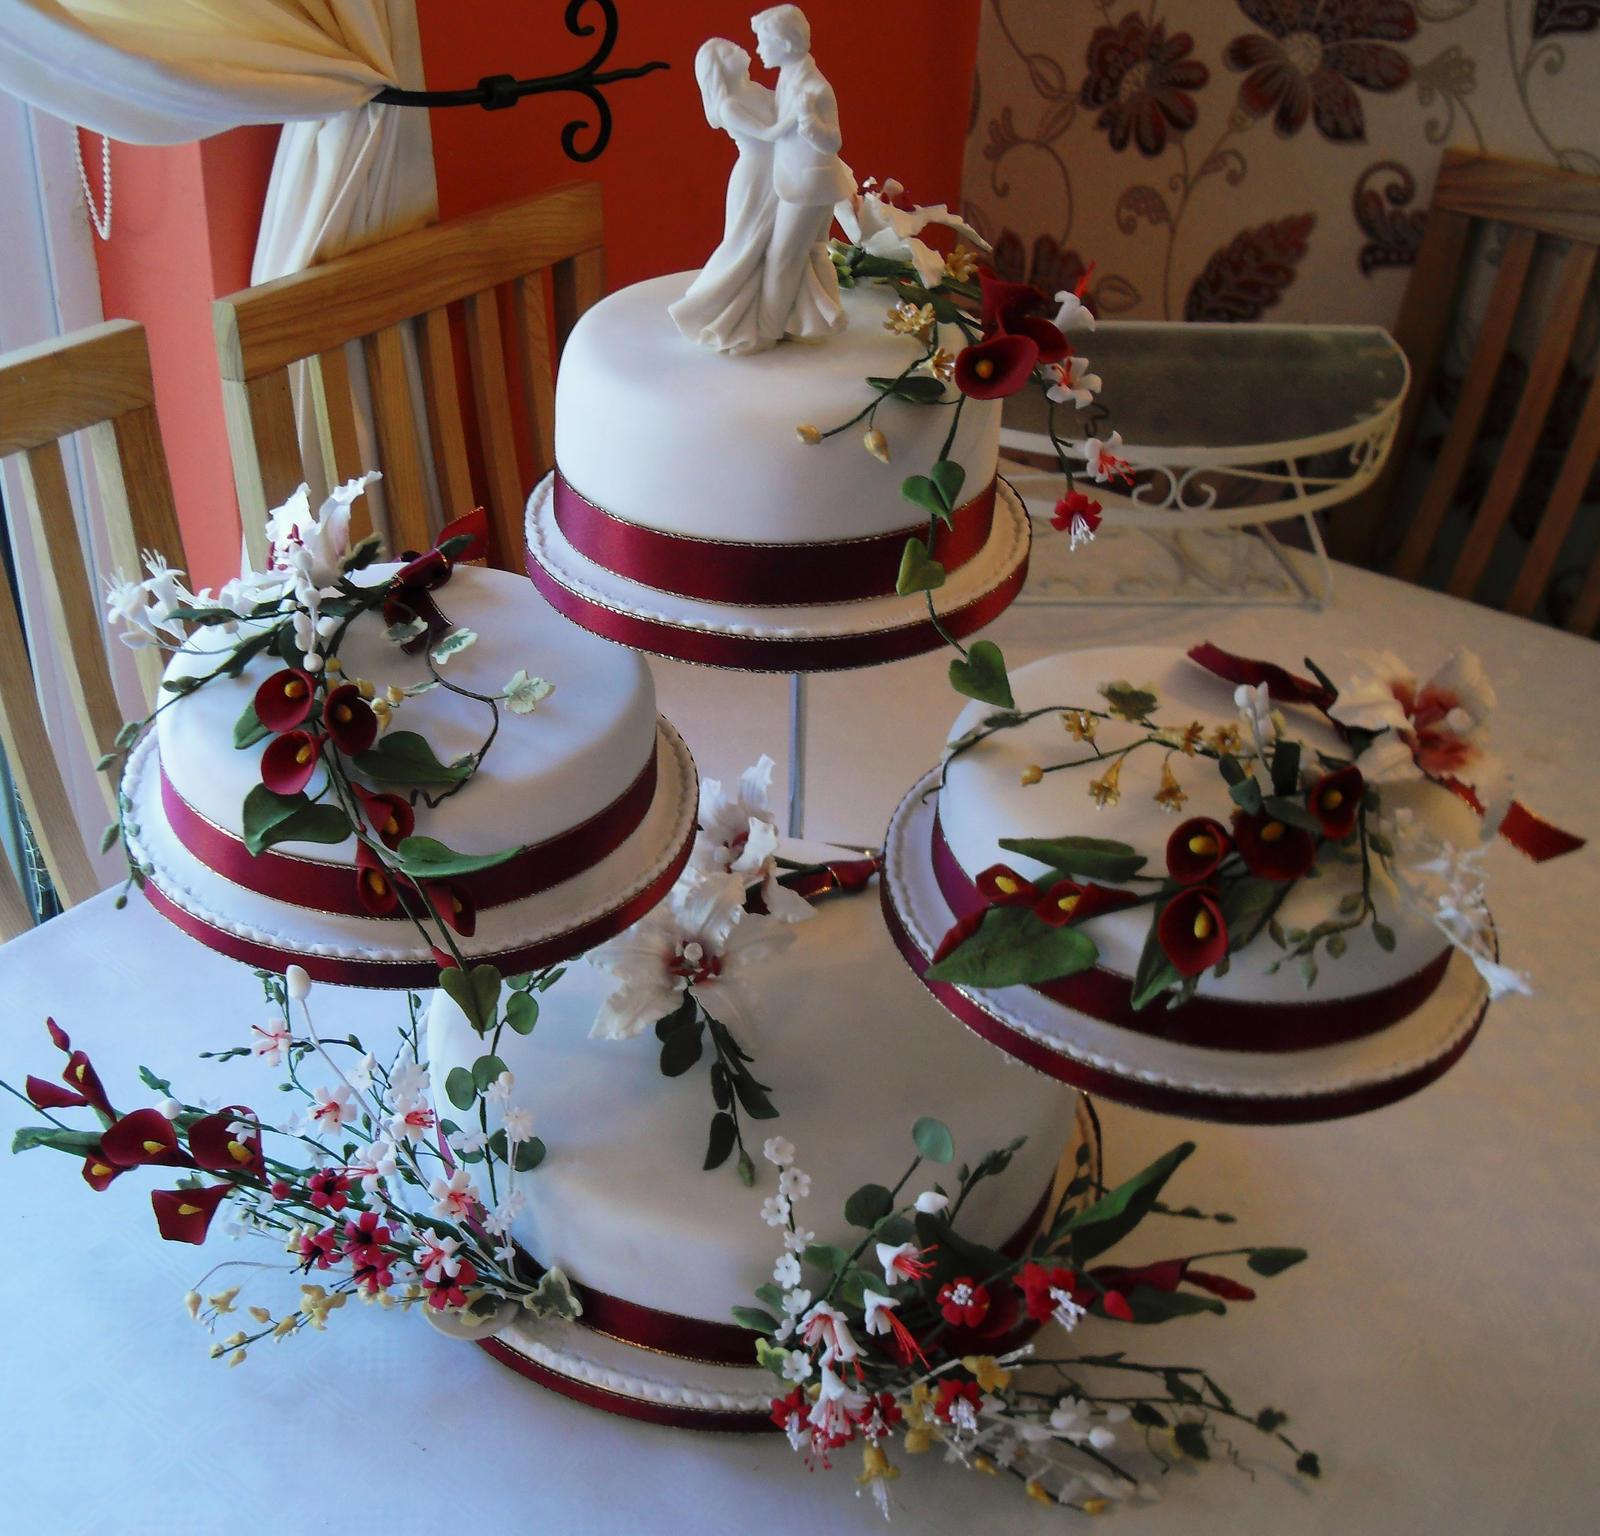 4 Tier wedding cake by Sugarflowers on DeviantArt